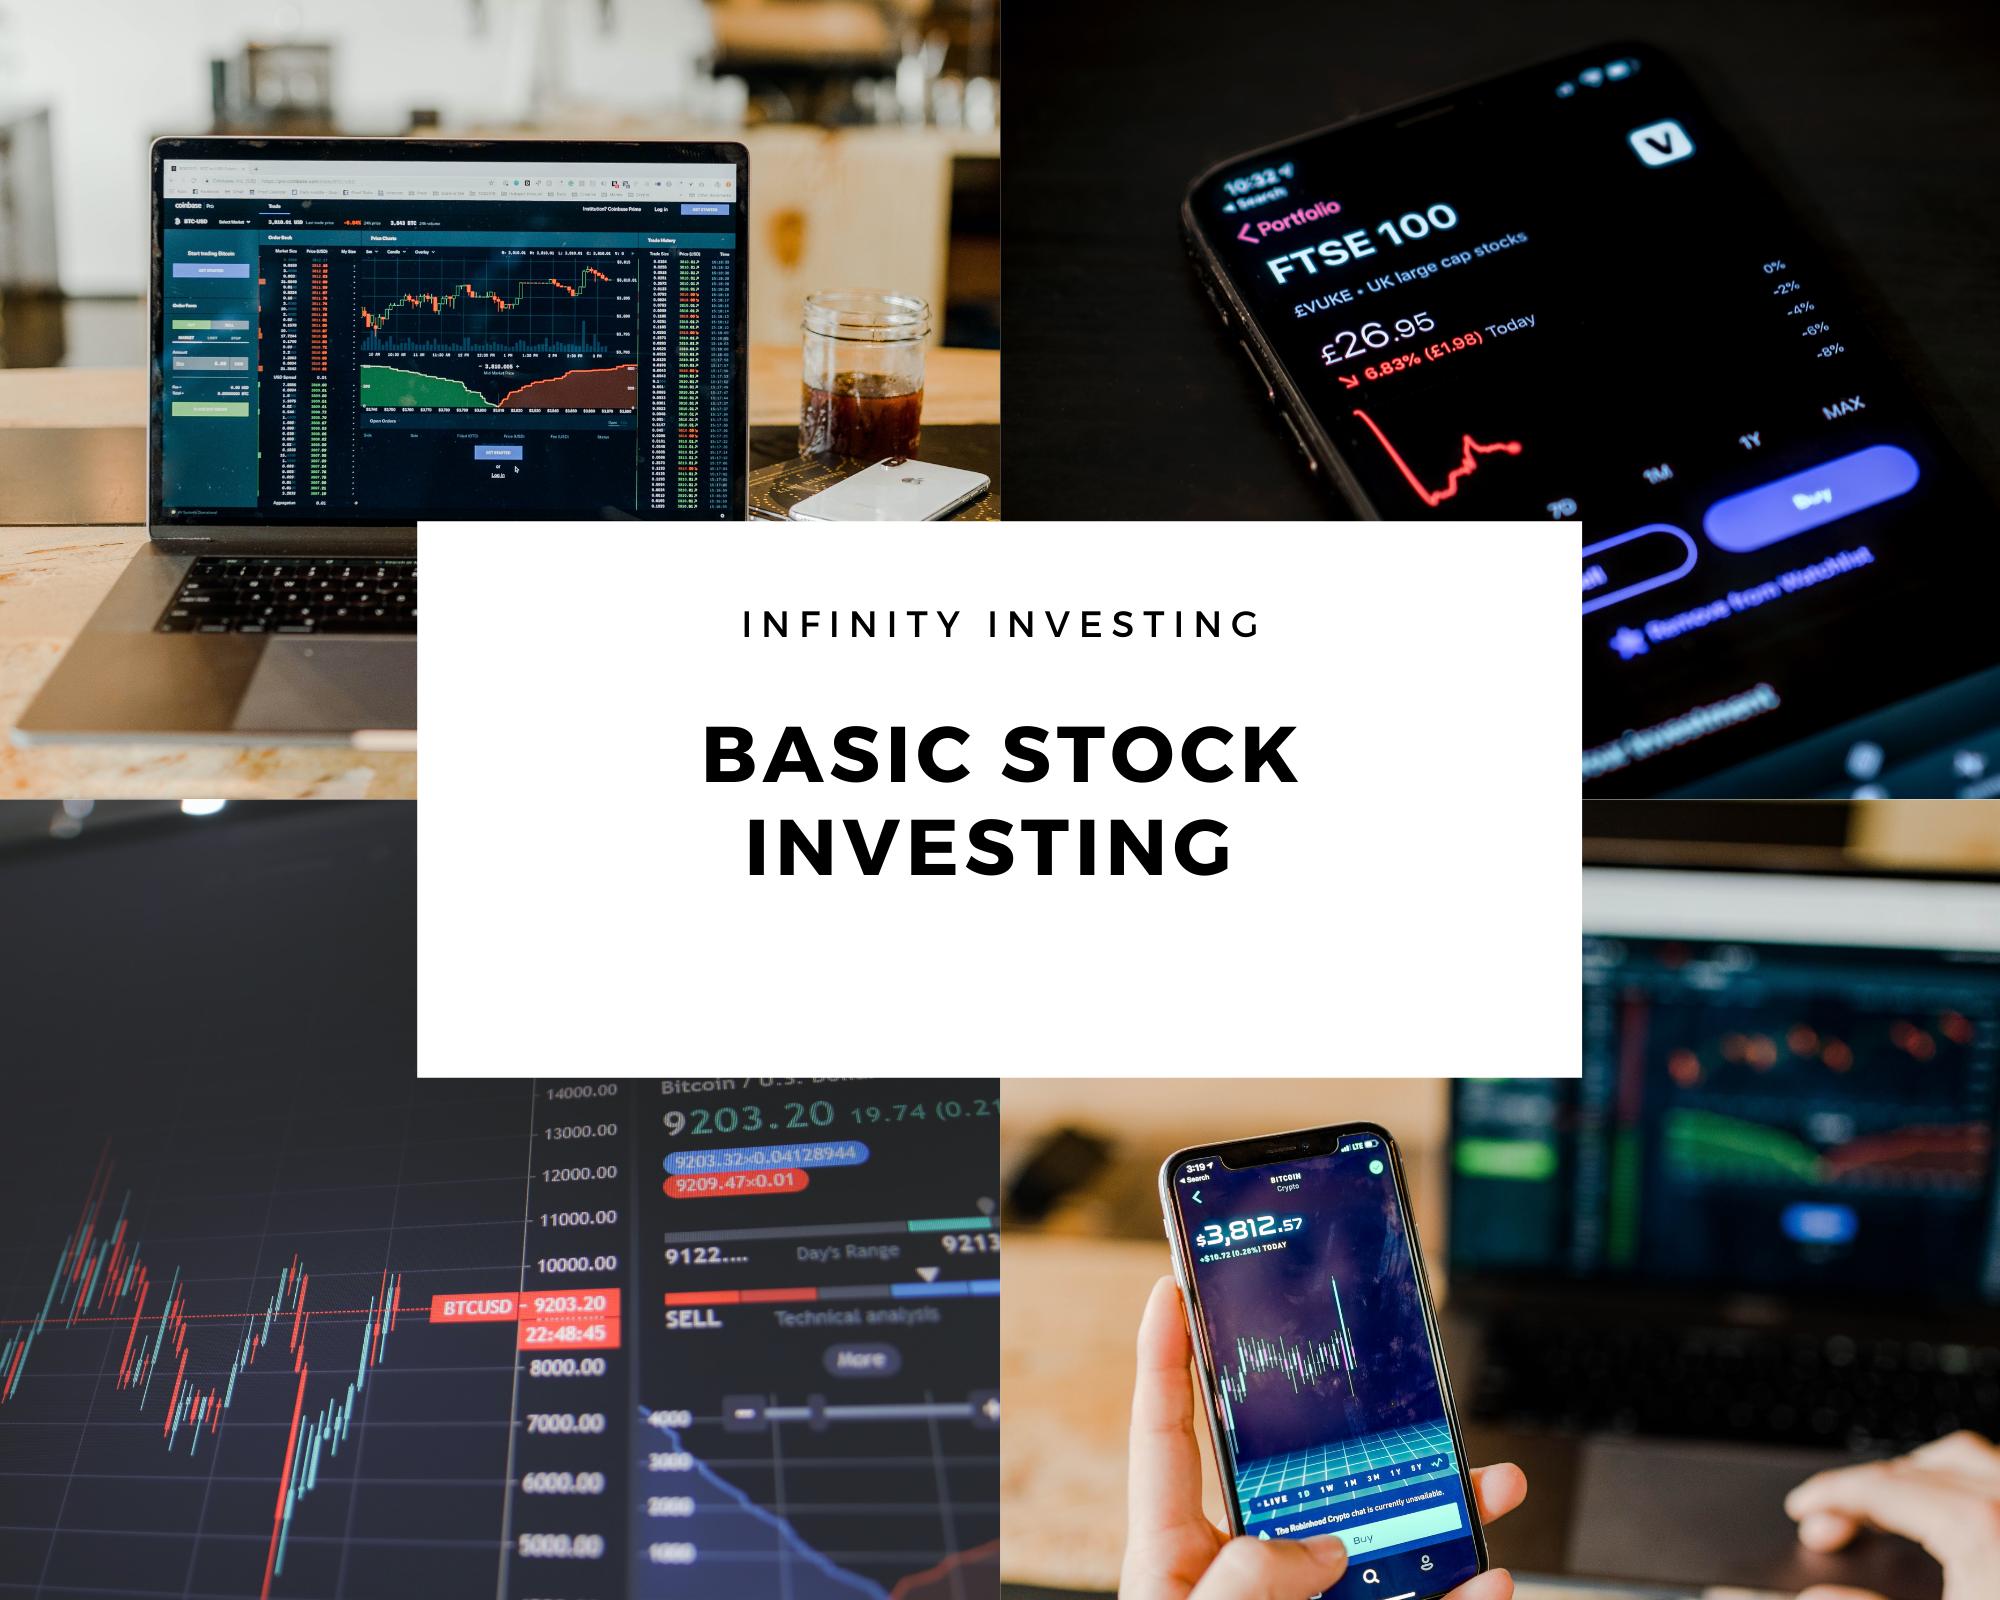 Basic Stock Investing